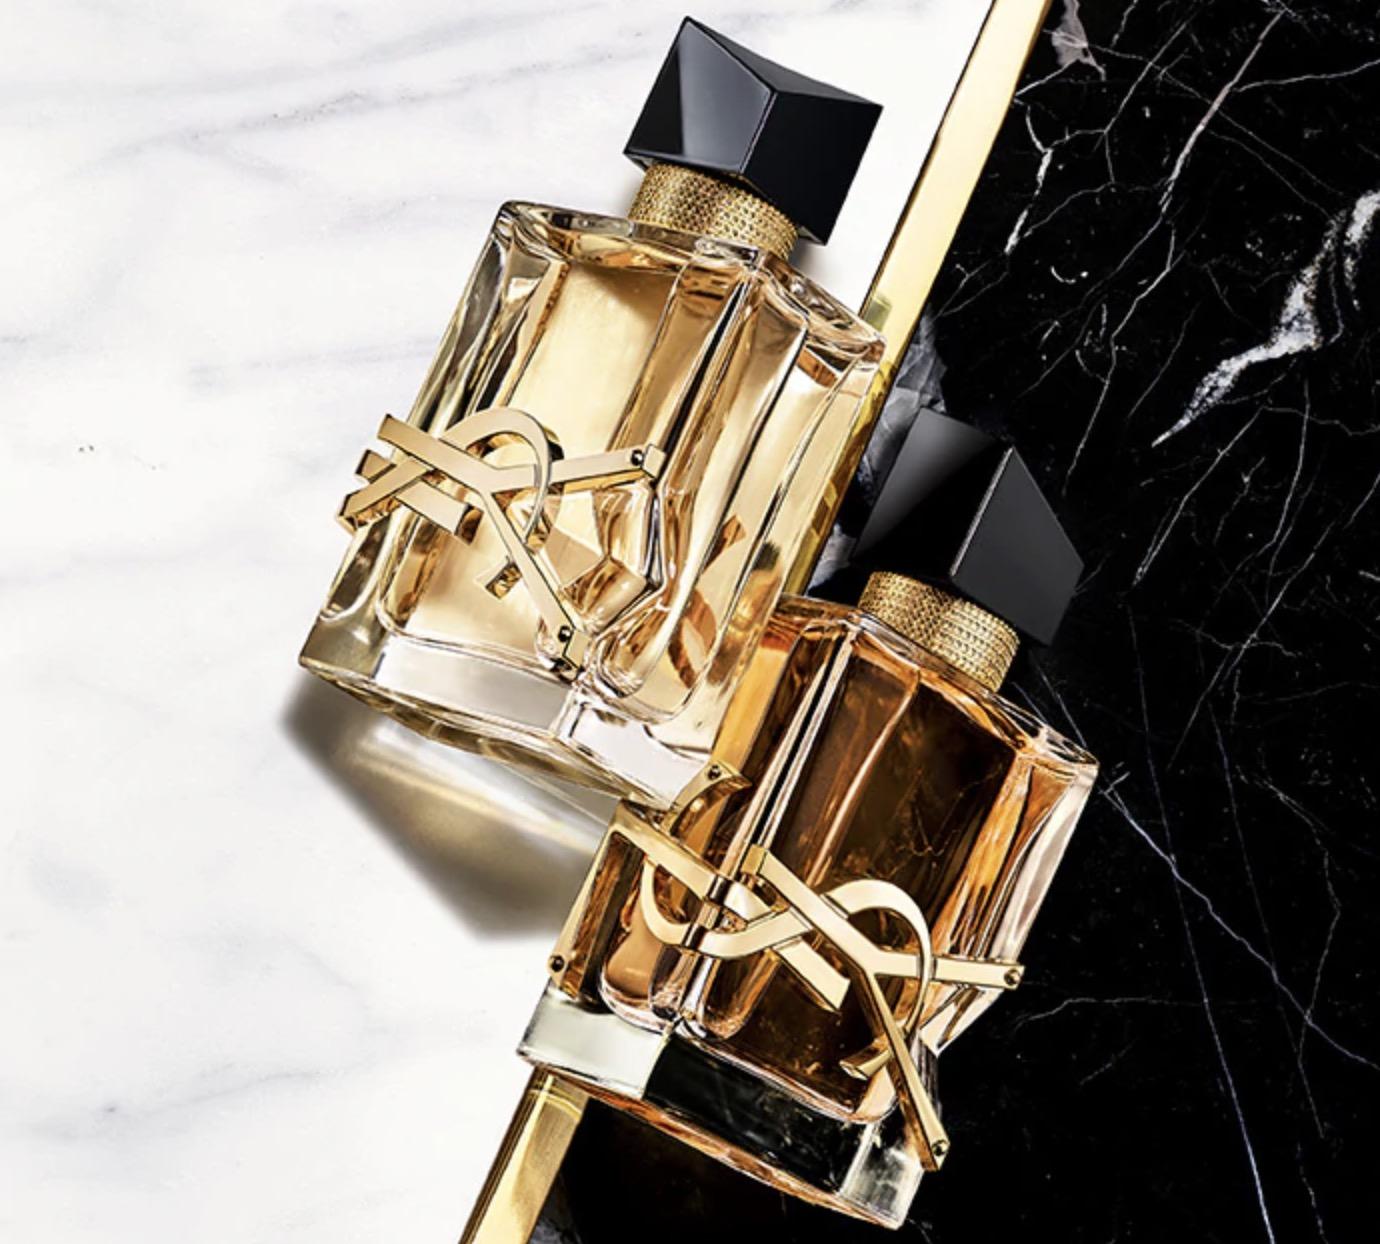 Perfeito para presentear! Yves Saint Laurent apresenta o Libre Eau de Parfum Intense